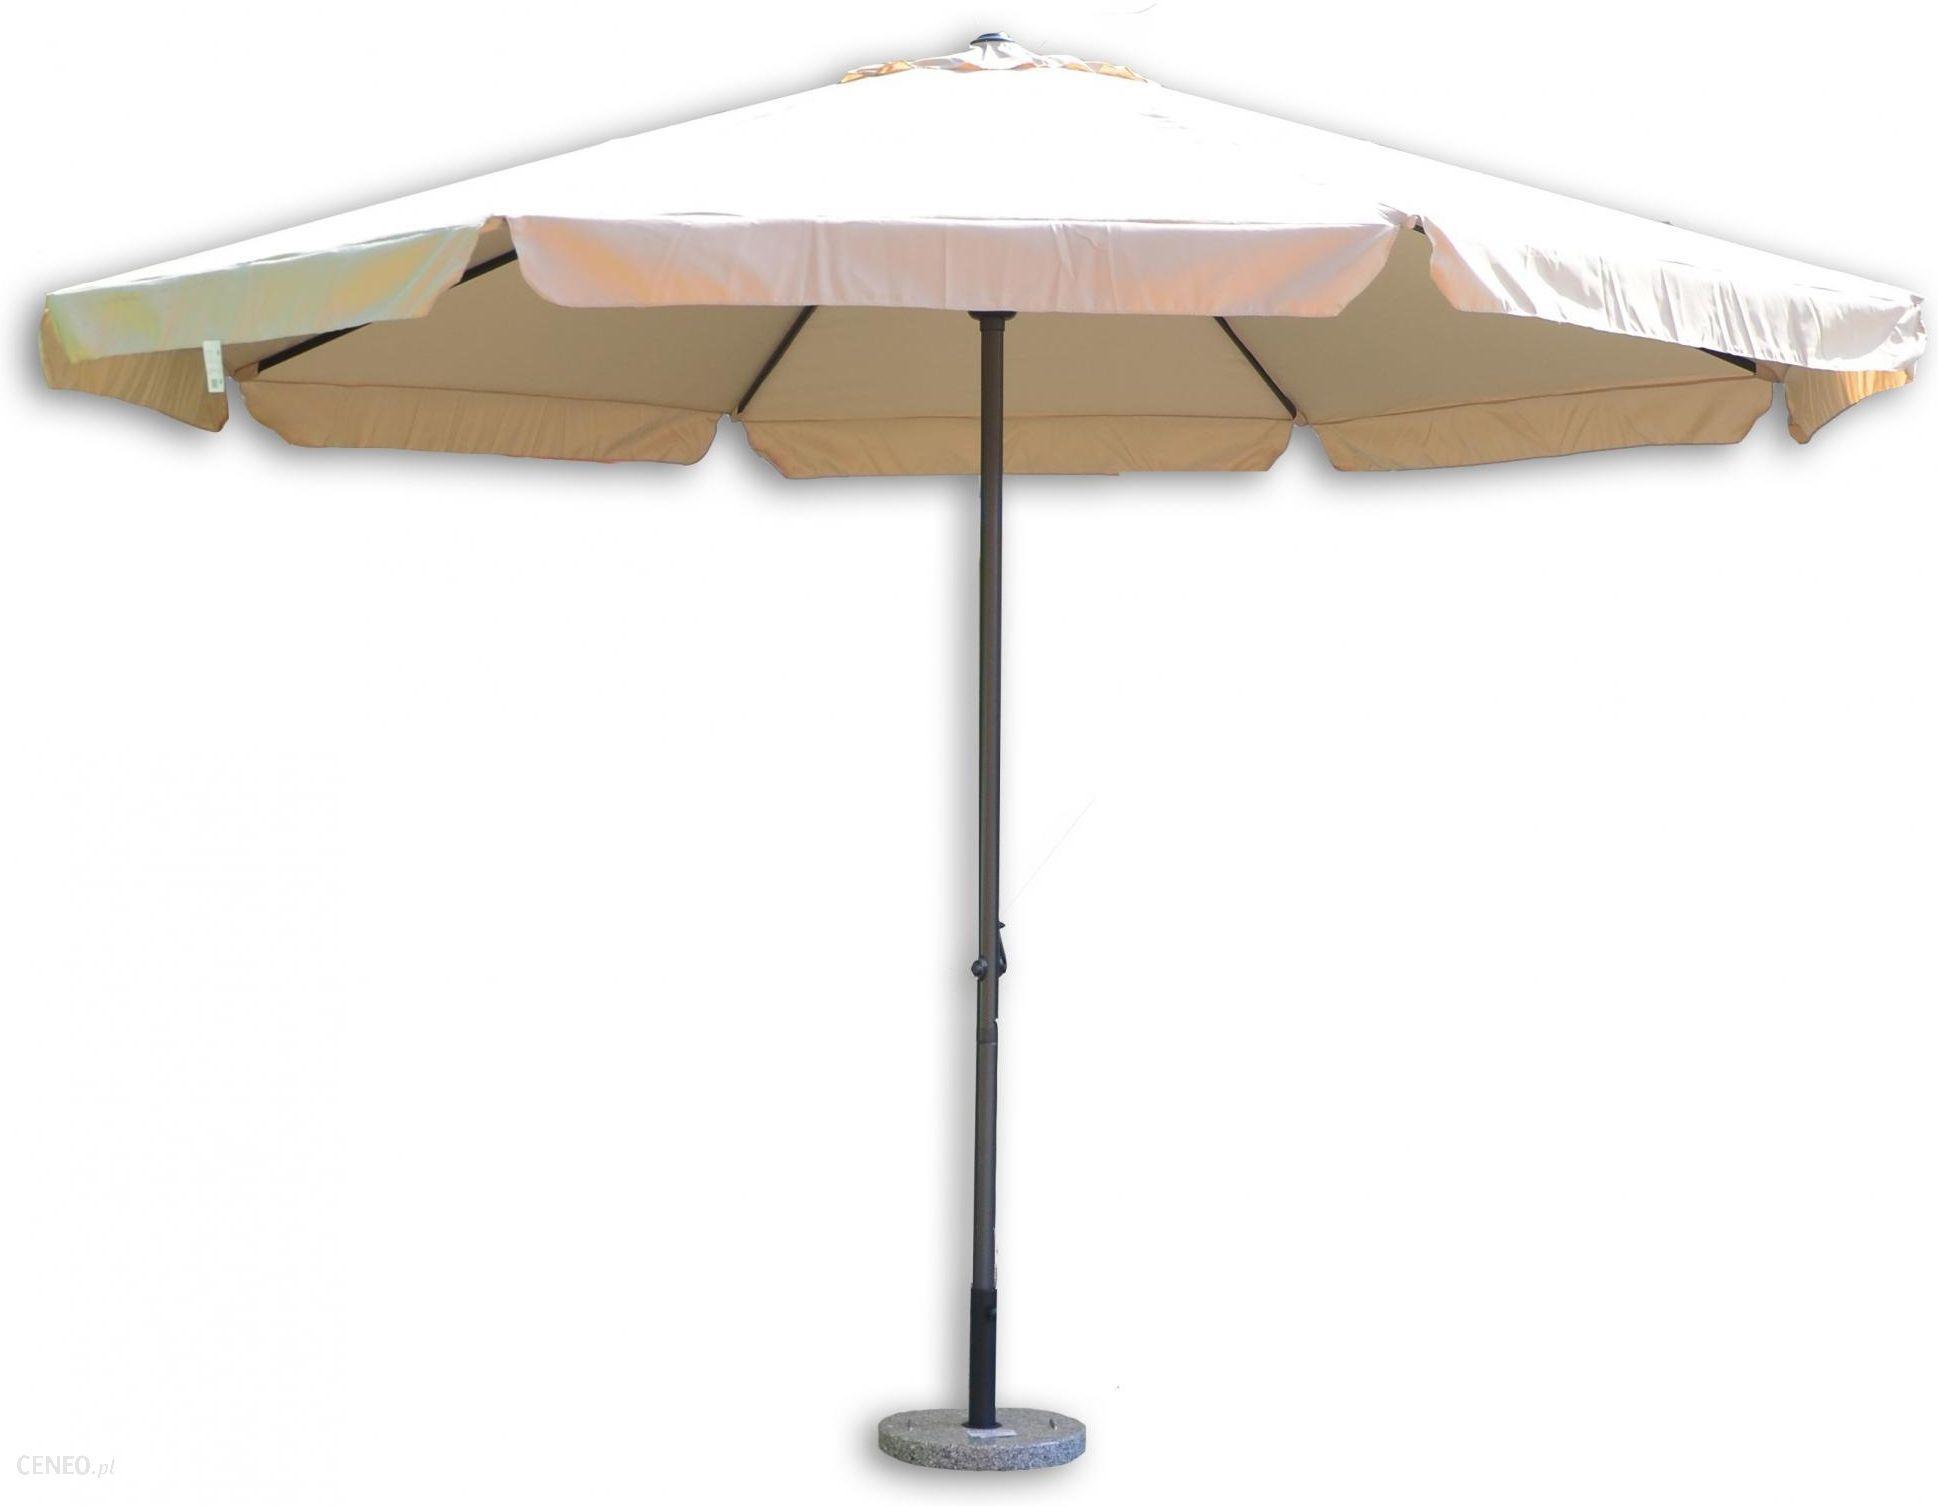 impressionnant de parasol 3x4 conception id es de design. Black Bedroom Furniture Sets. Home Design Ideas